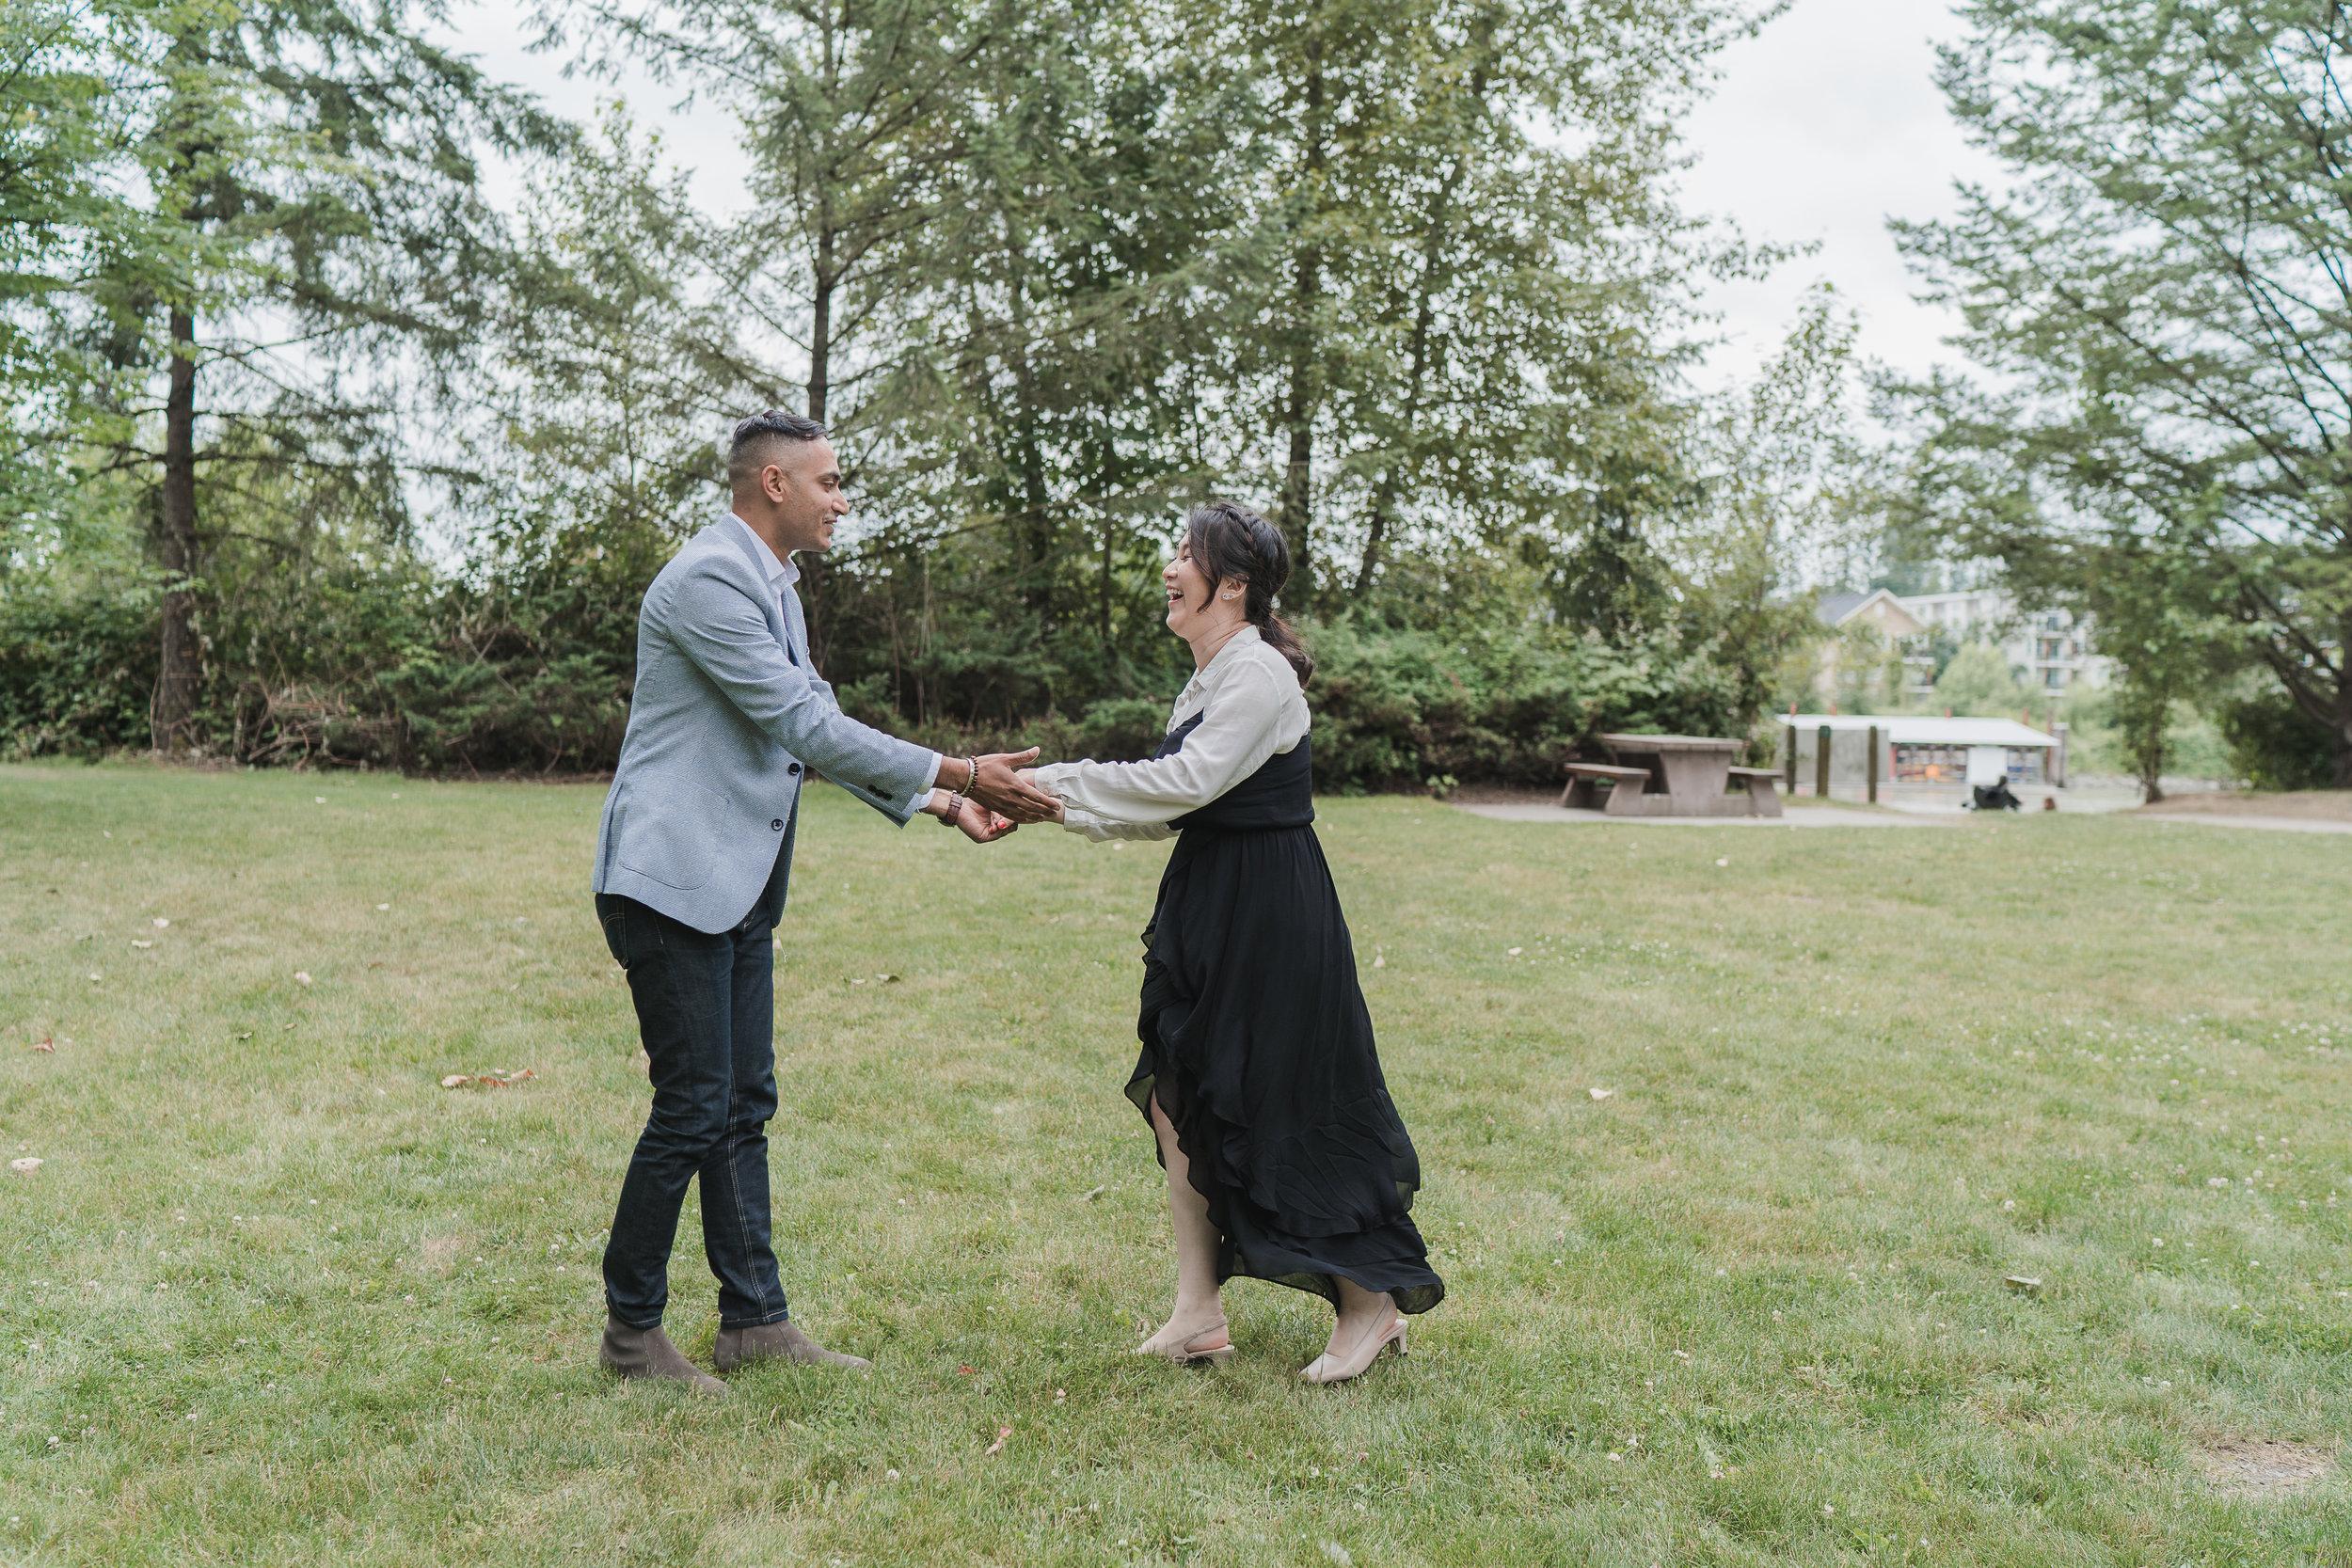 20190622 - Monika & Johnson Engagement- 0063.jpg